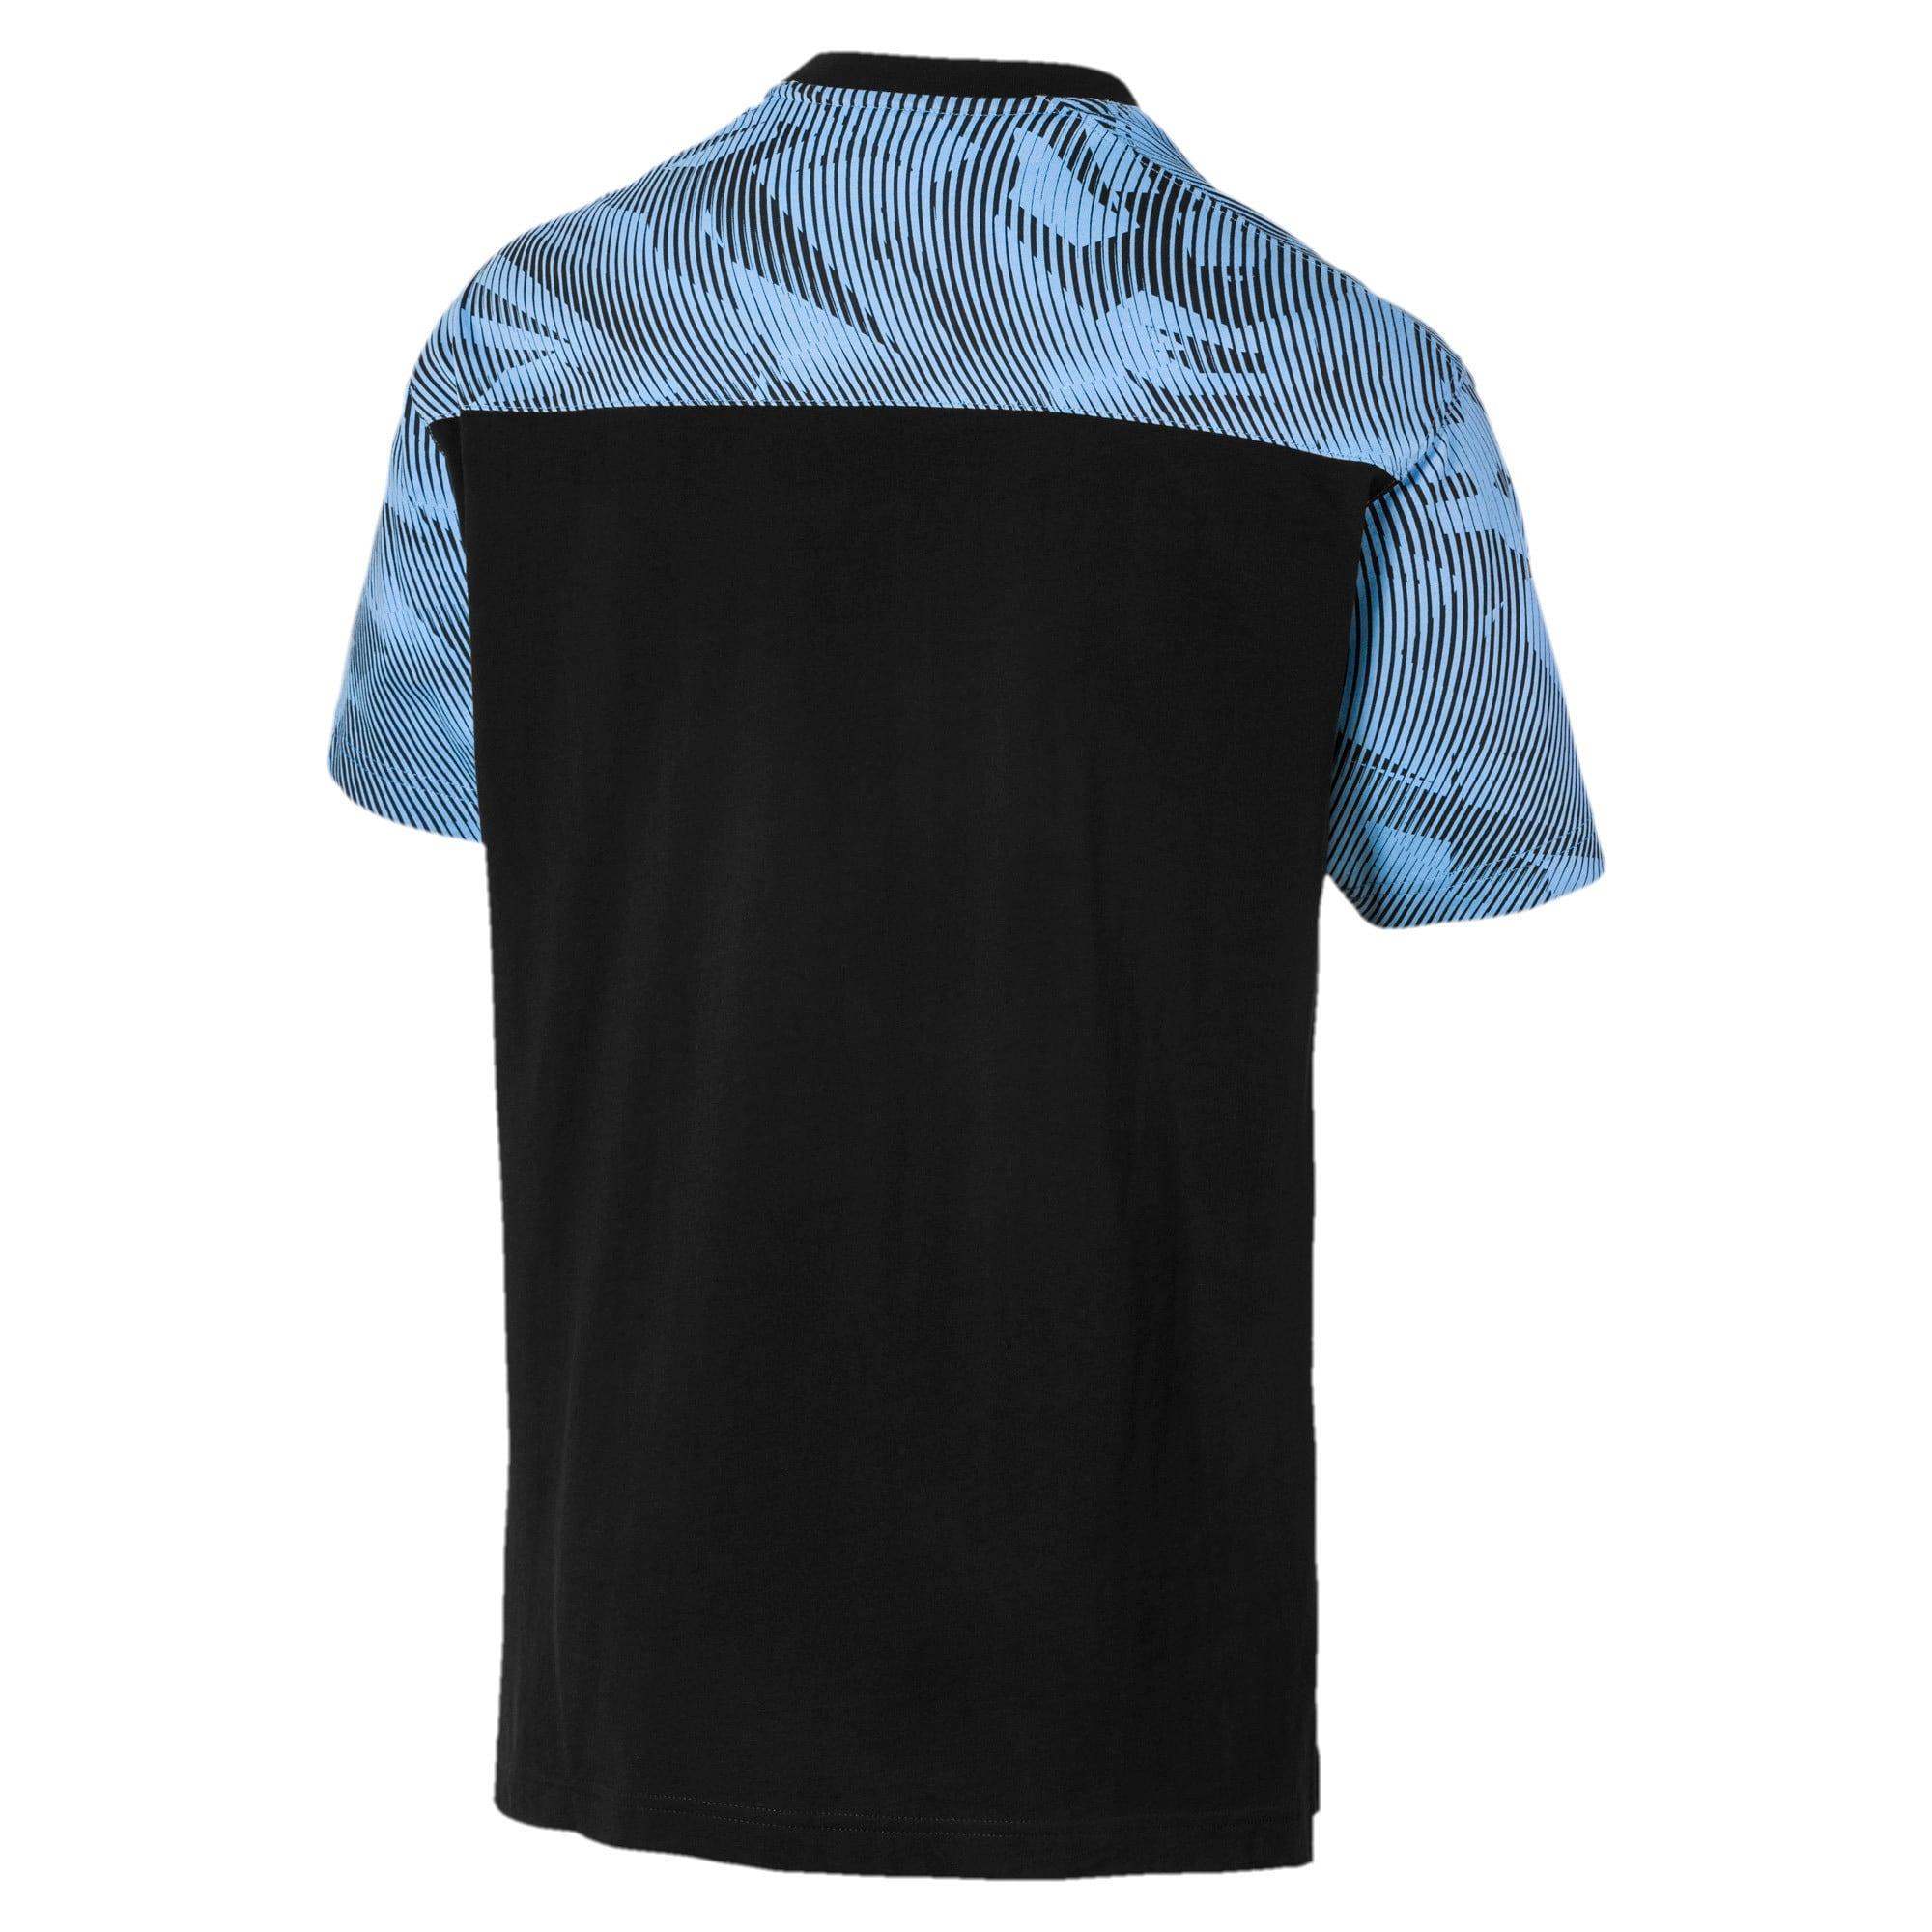 Thumbnail 2 of Man City Casuals Men's Tee, Puma Black-Team Light Blue, medium